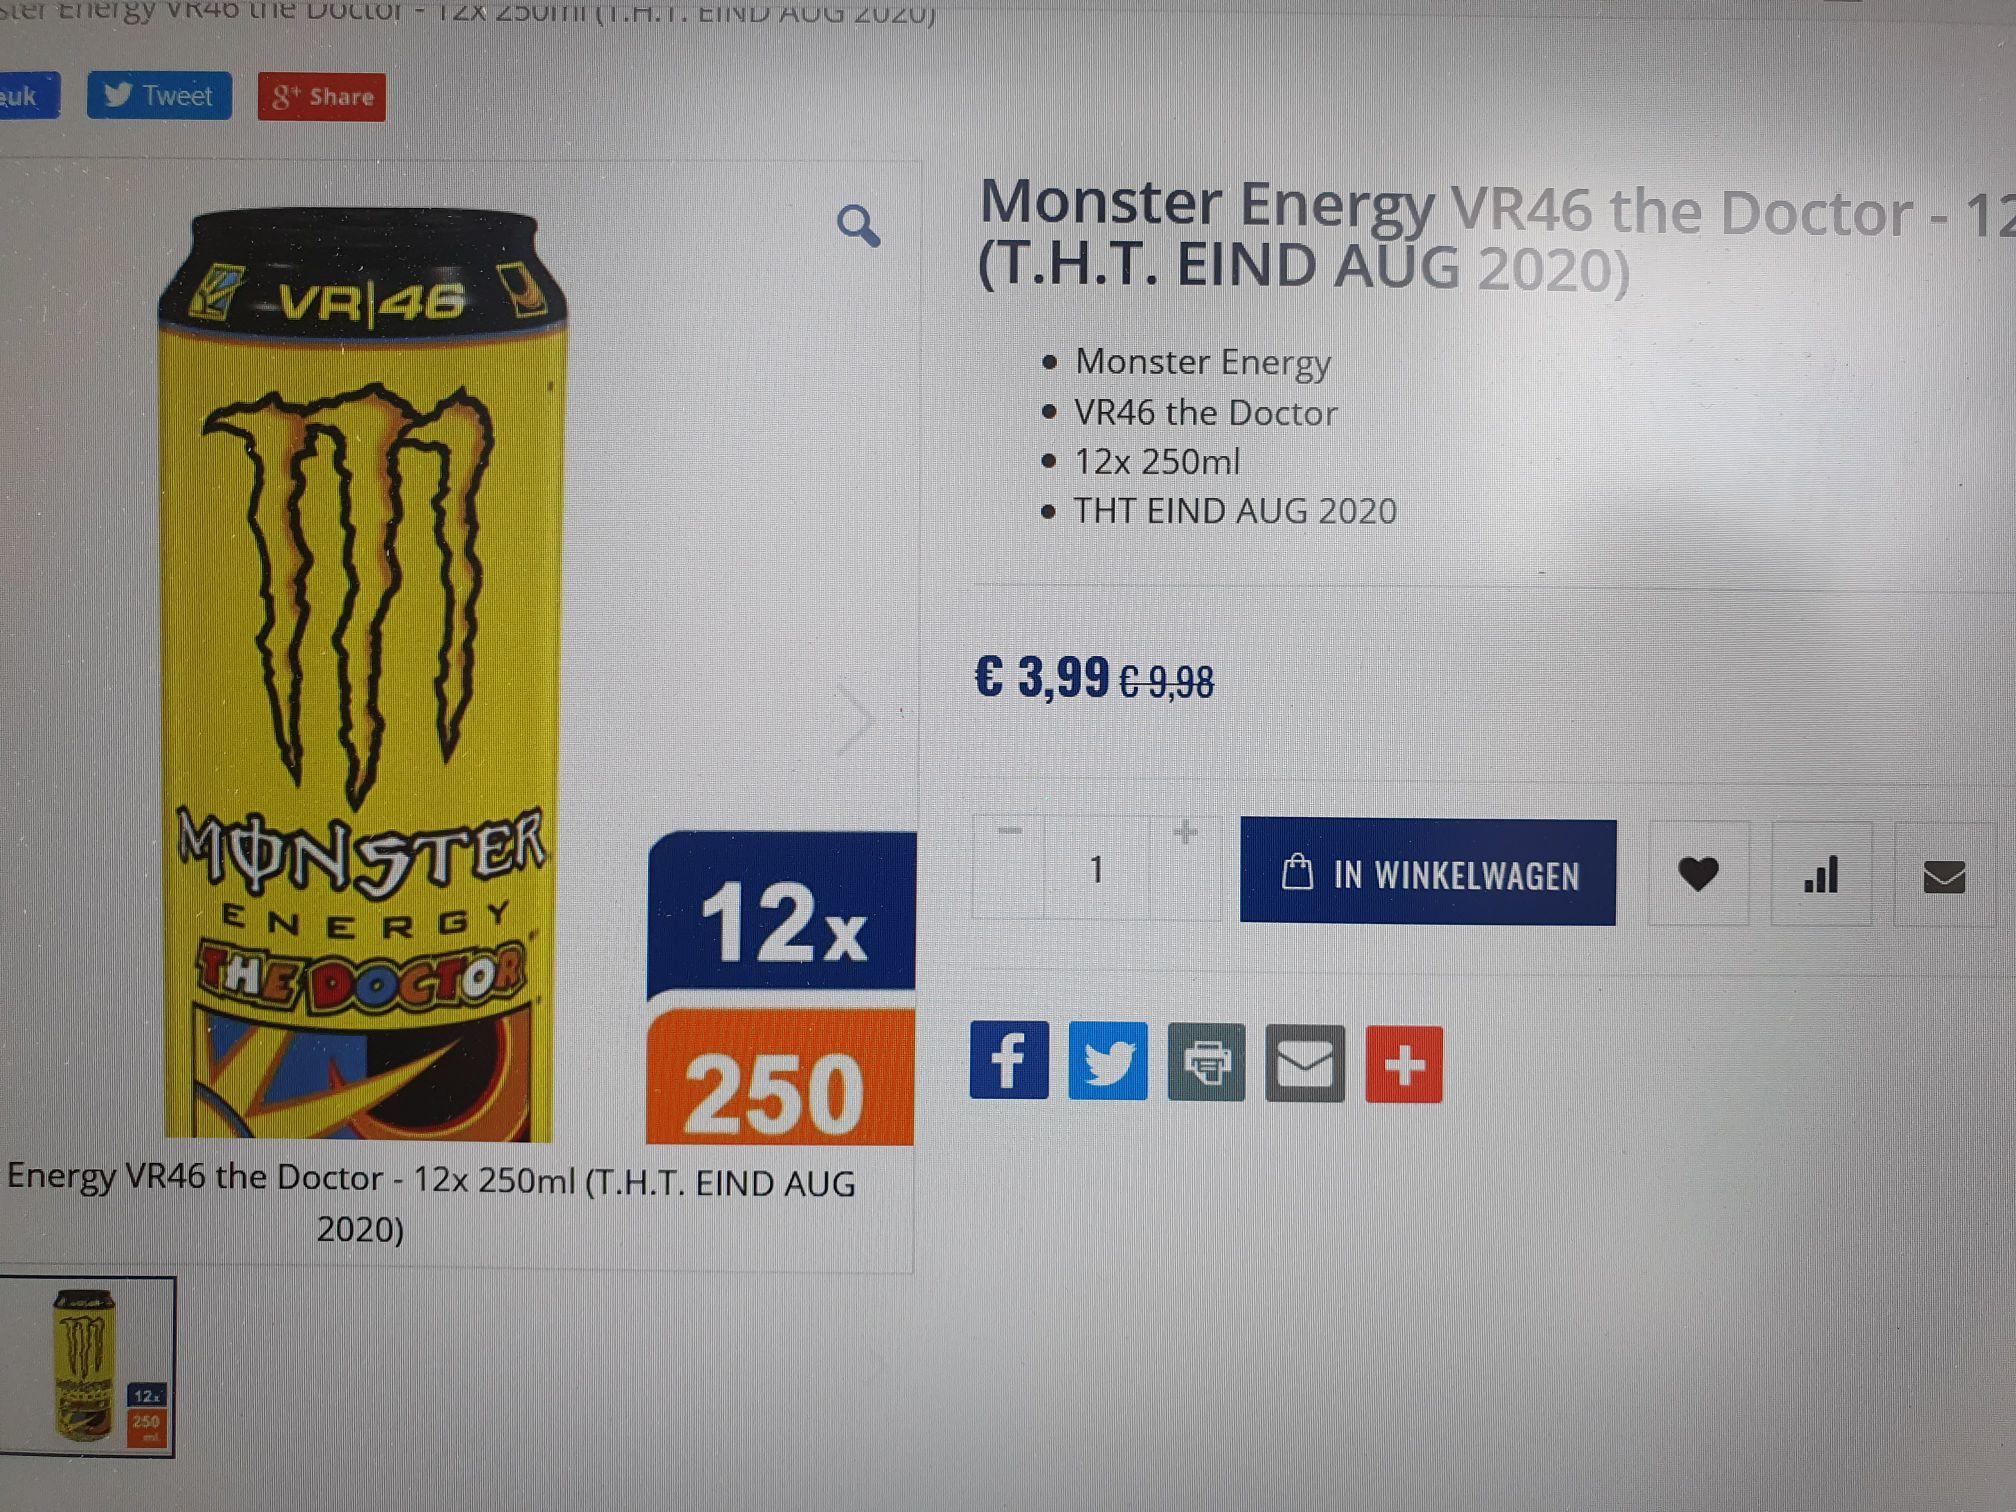 Monster energy VR46 the Doctor 12x 250ml blikjes voor 3.99 @FoodWorldXL